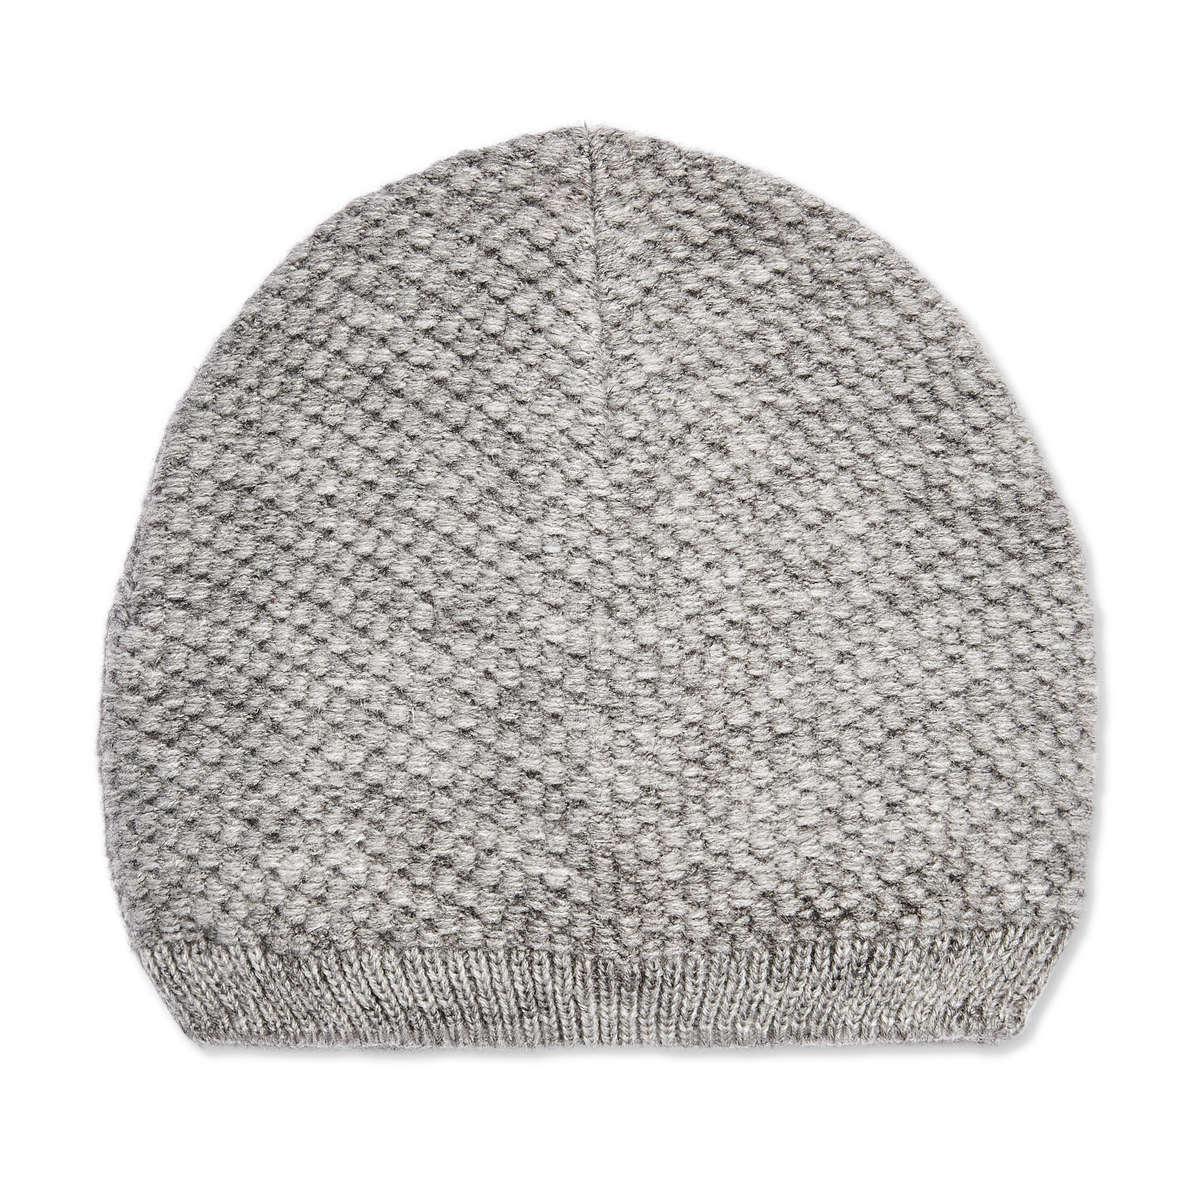 Joe Fresh Popcorn Knit Beanie in Gray - Lyst c3cea2545bd1